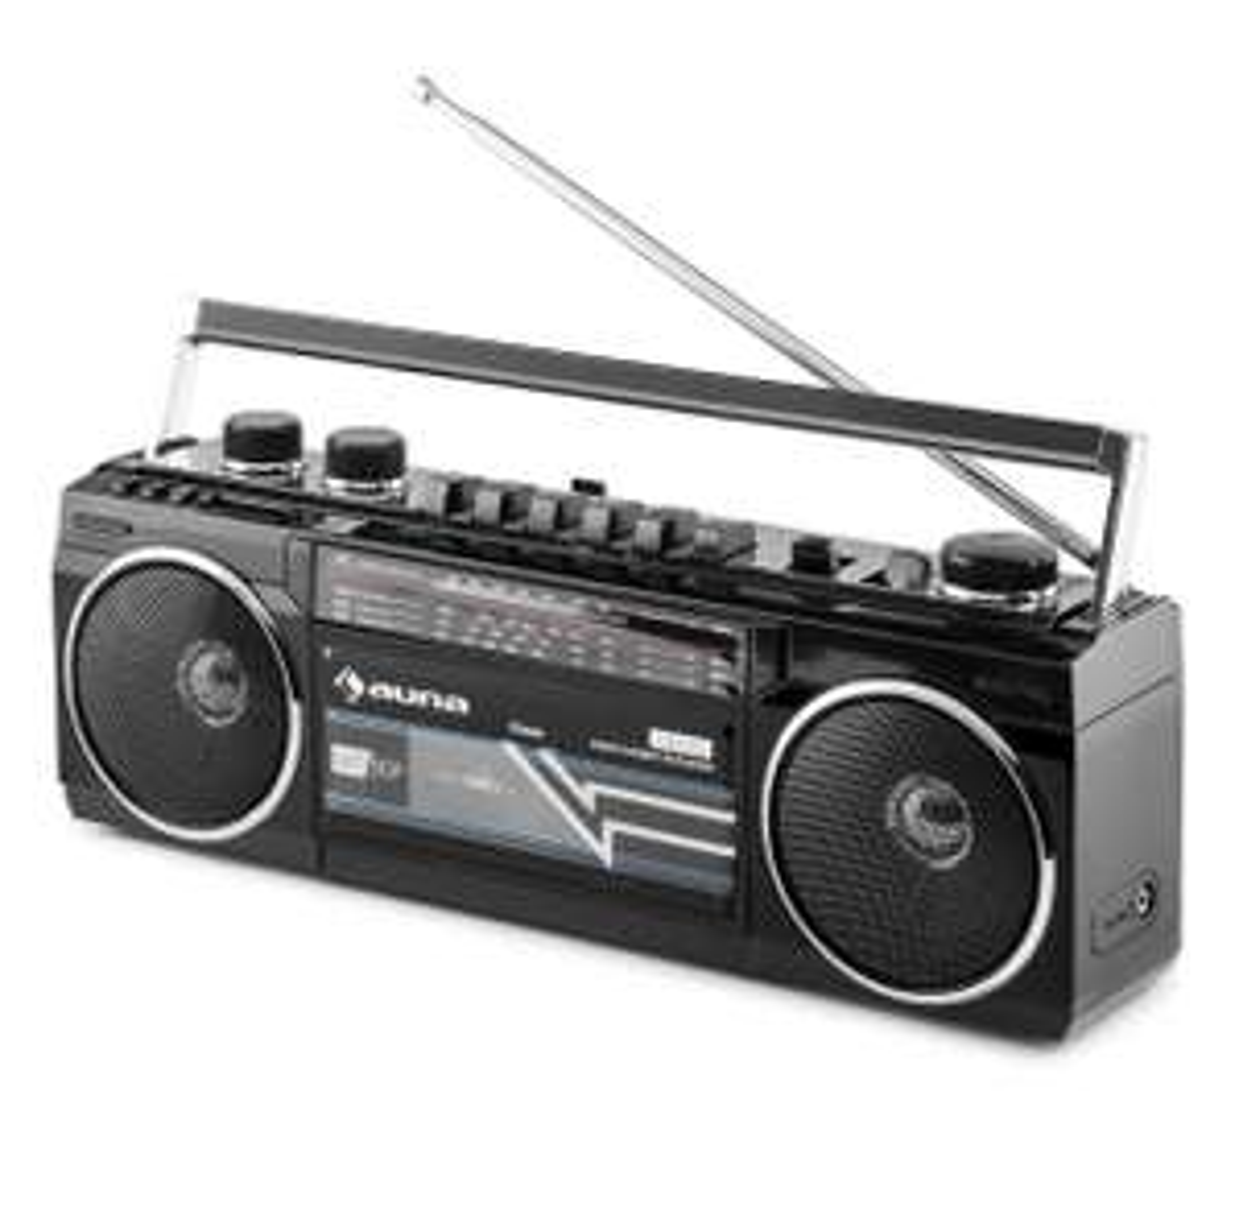 Poste radio cassette portable rétro Ghetto Blaster  auna duke - (vendeur tiers)